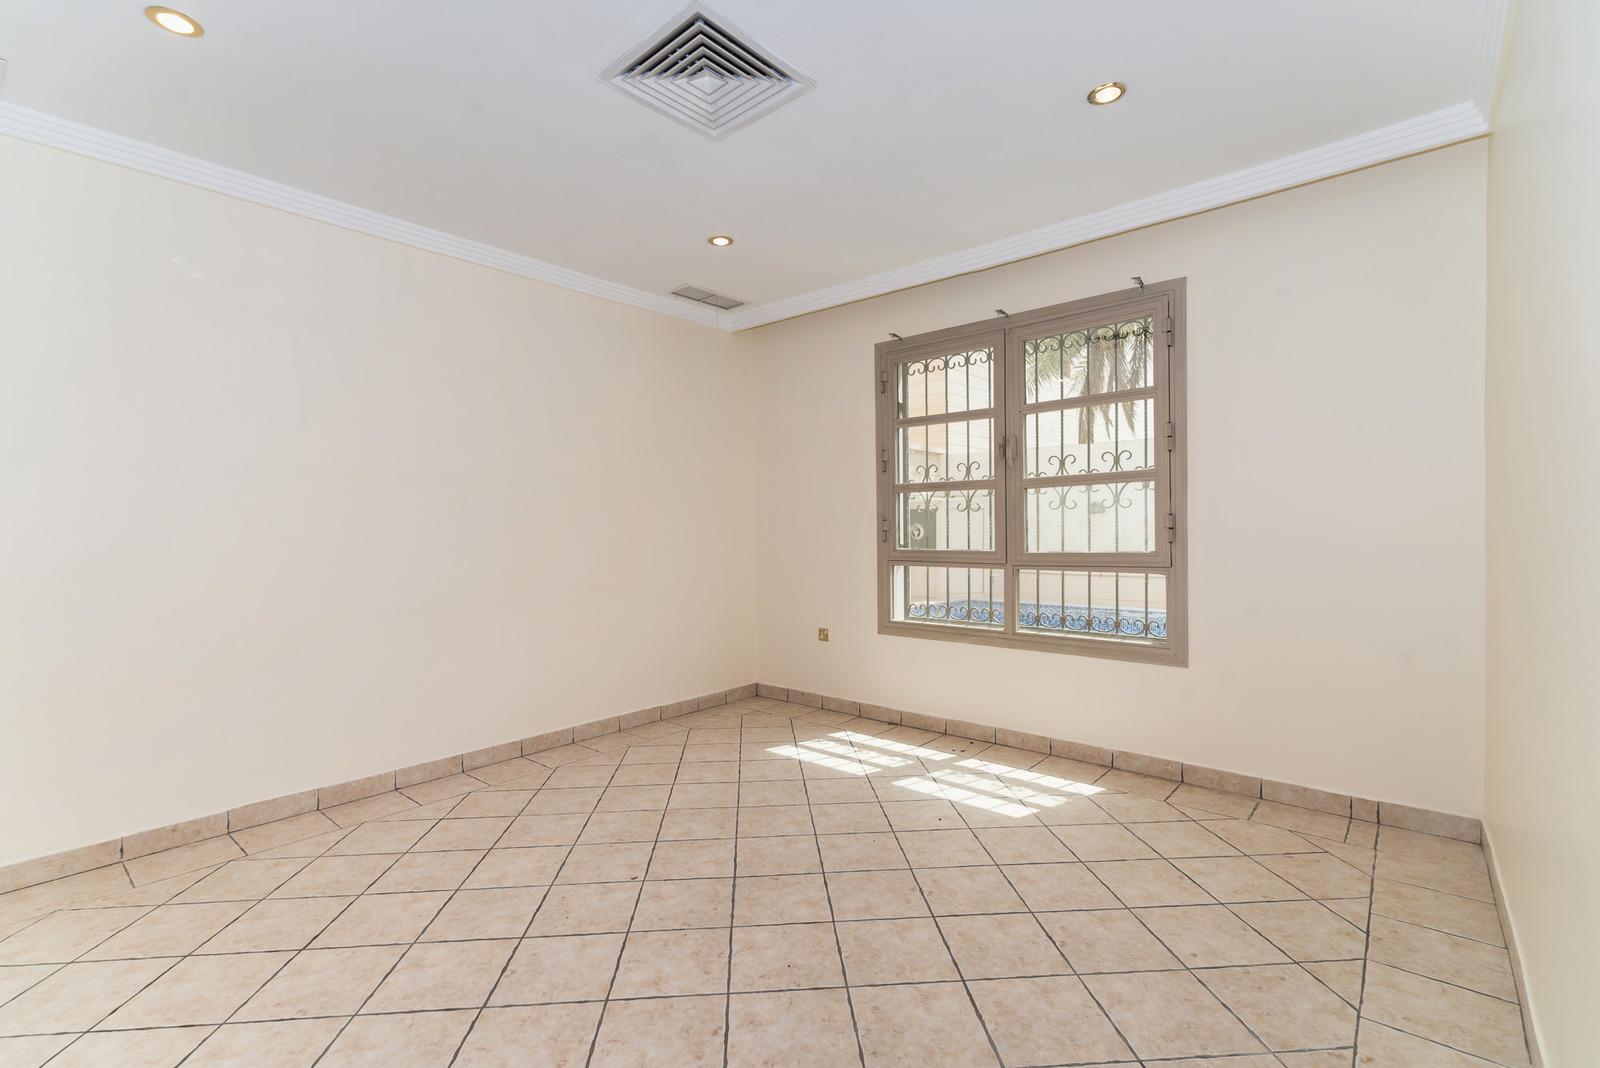 Salwa – older, unfurnished, three bedroom apartment w/small pool